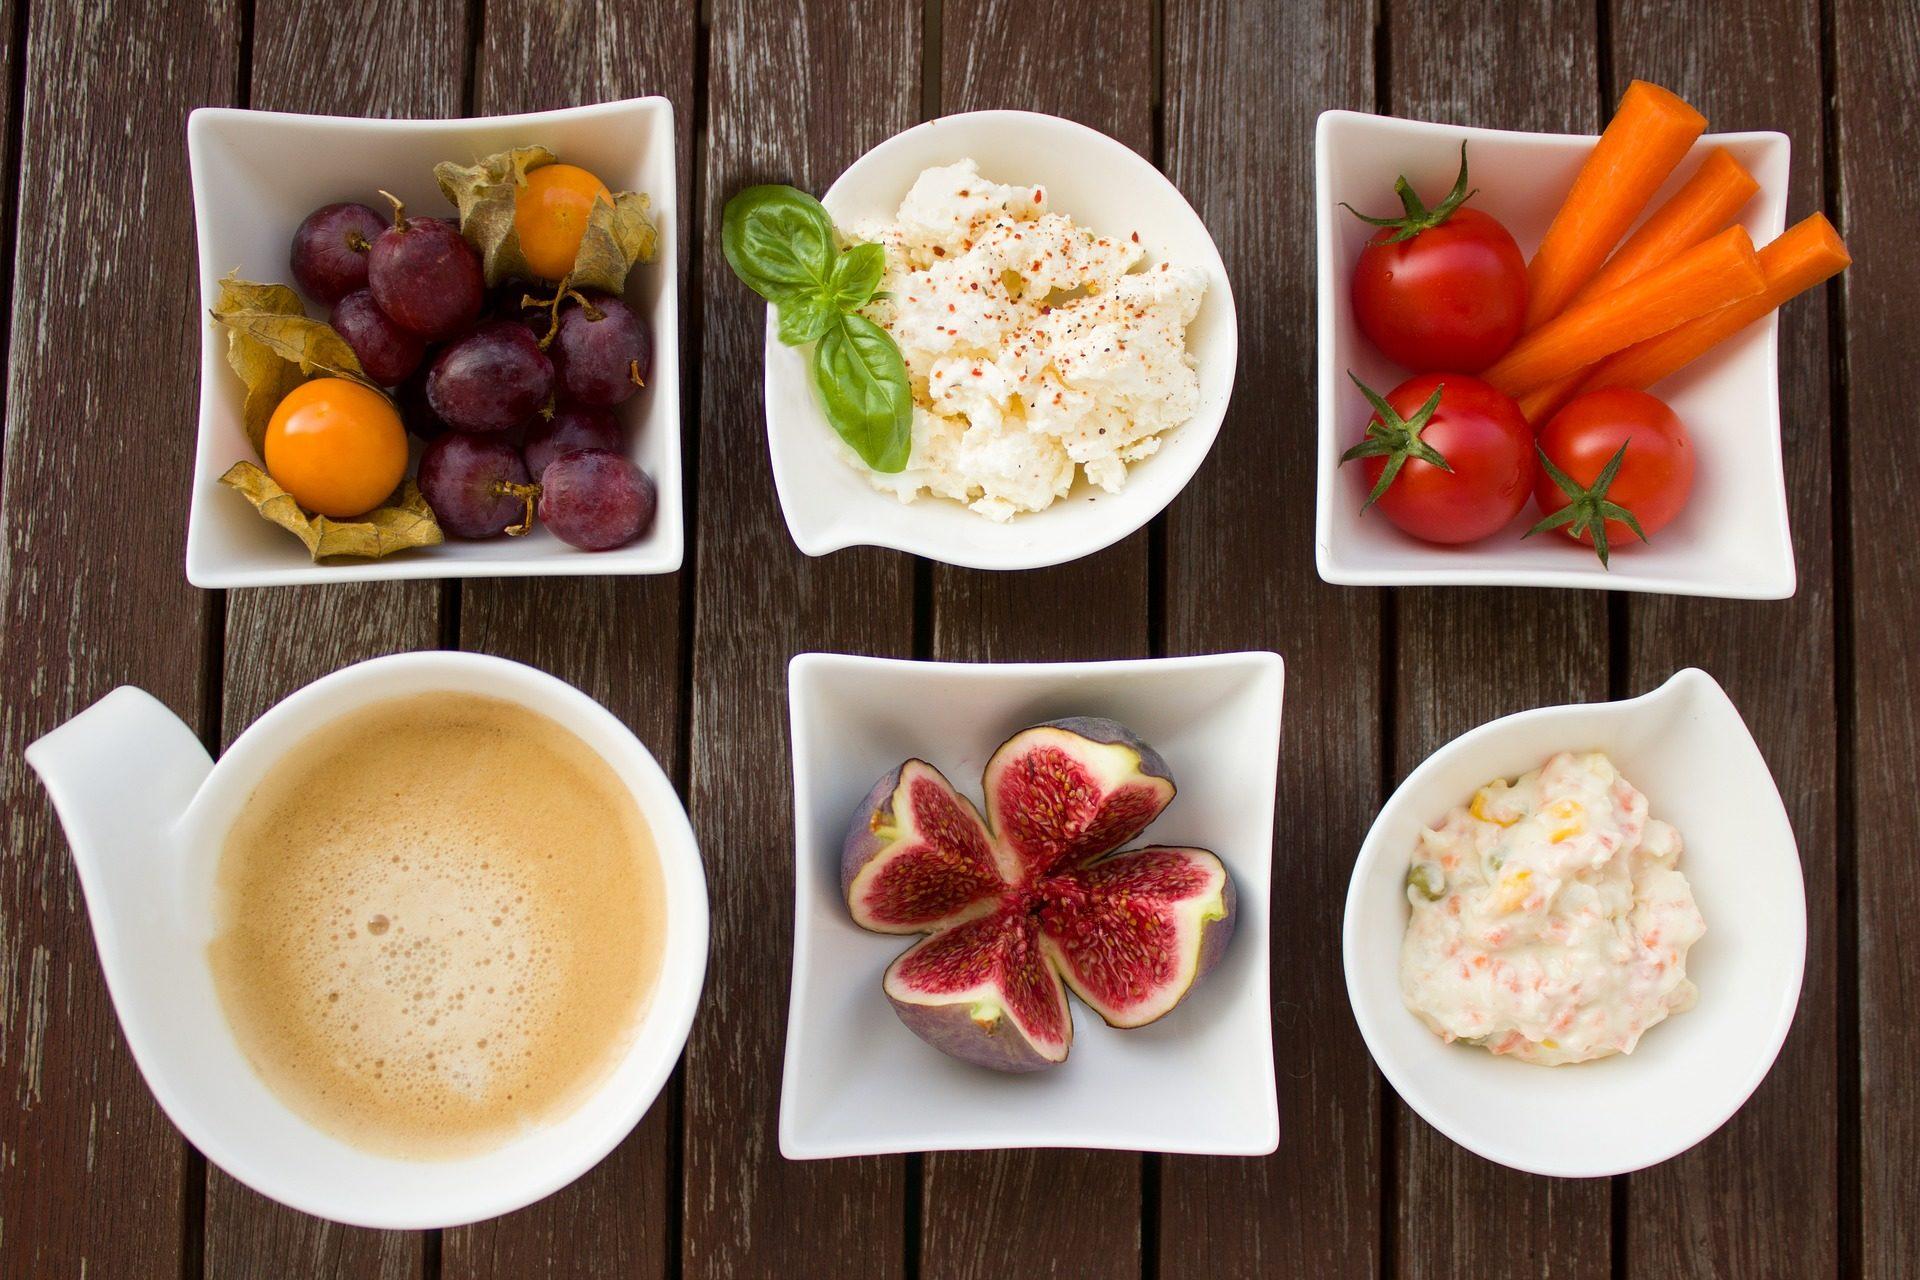 le petit déjeuner, fruits, café, légumes, carottes, tomates, figues sèches - Fonds d'écran HD - Professor-falken.com